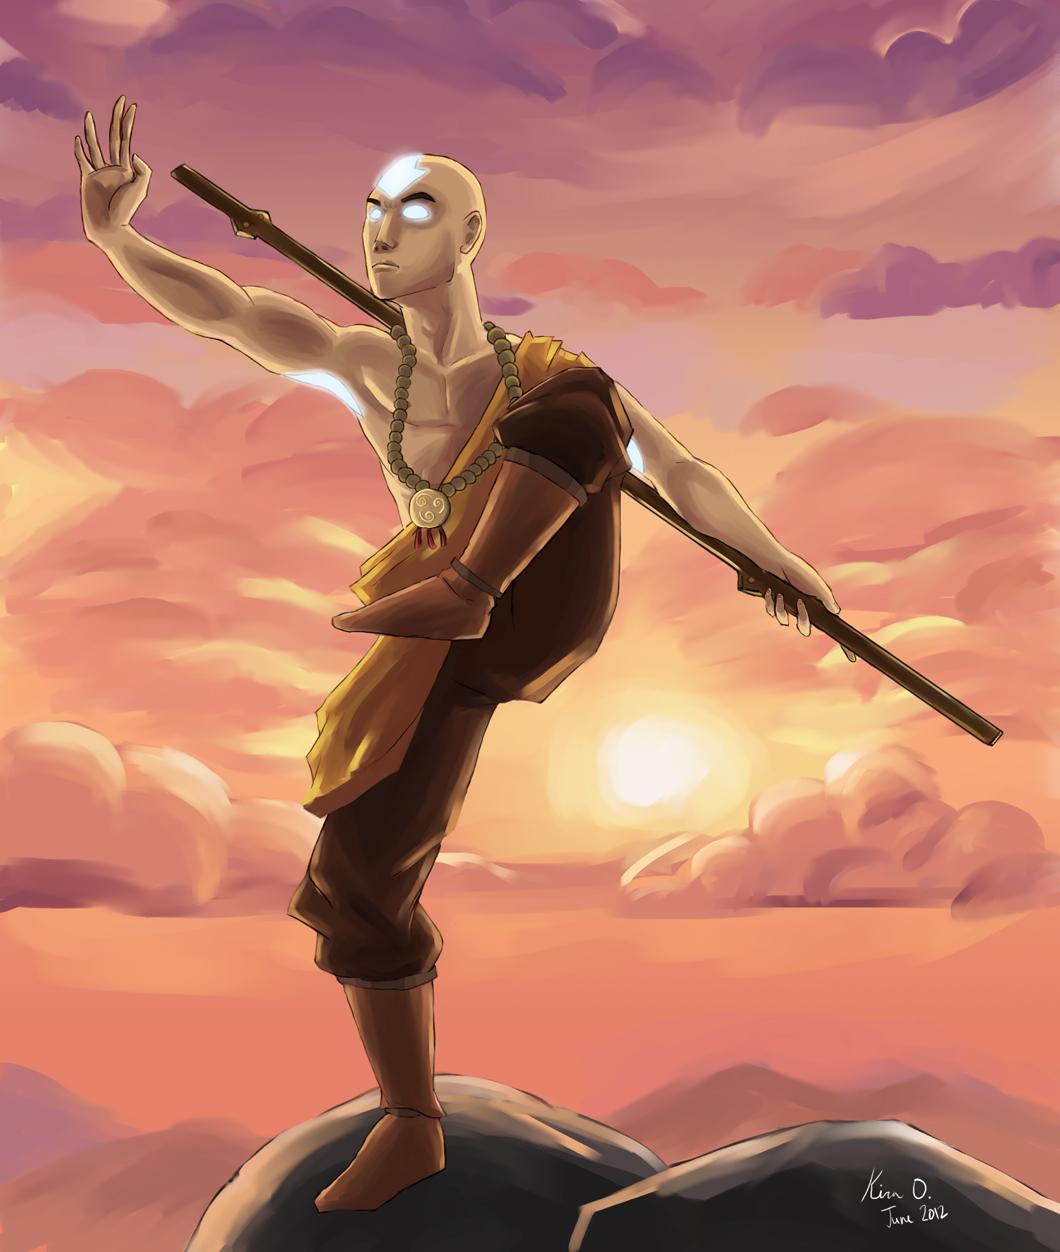 Avatar Aang: Avatar Aang By Kiraoka On DeviantArt